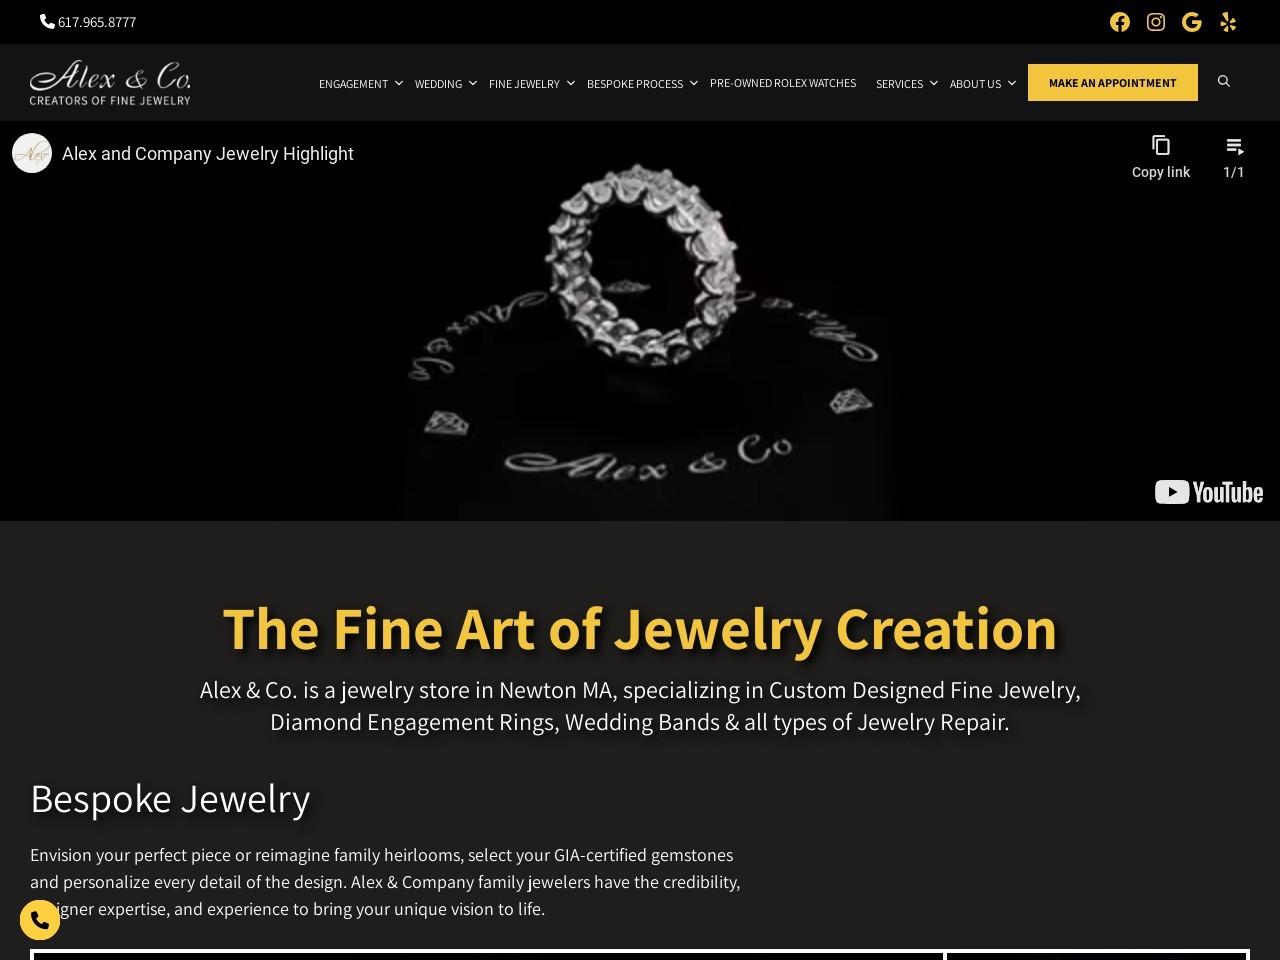 Buy Diamond Engagement Rings in Newton, MA